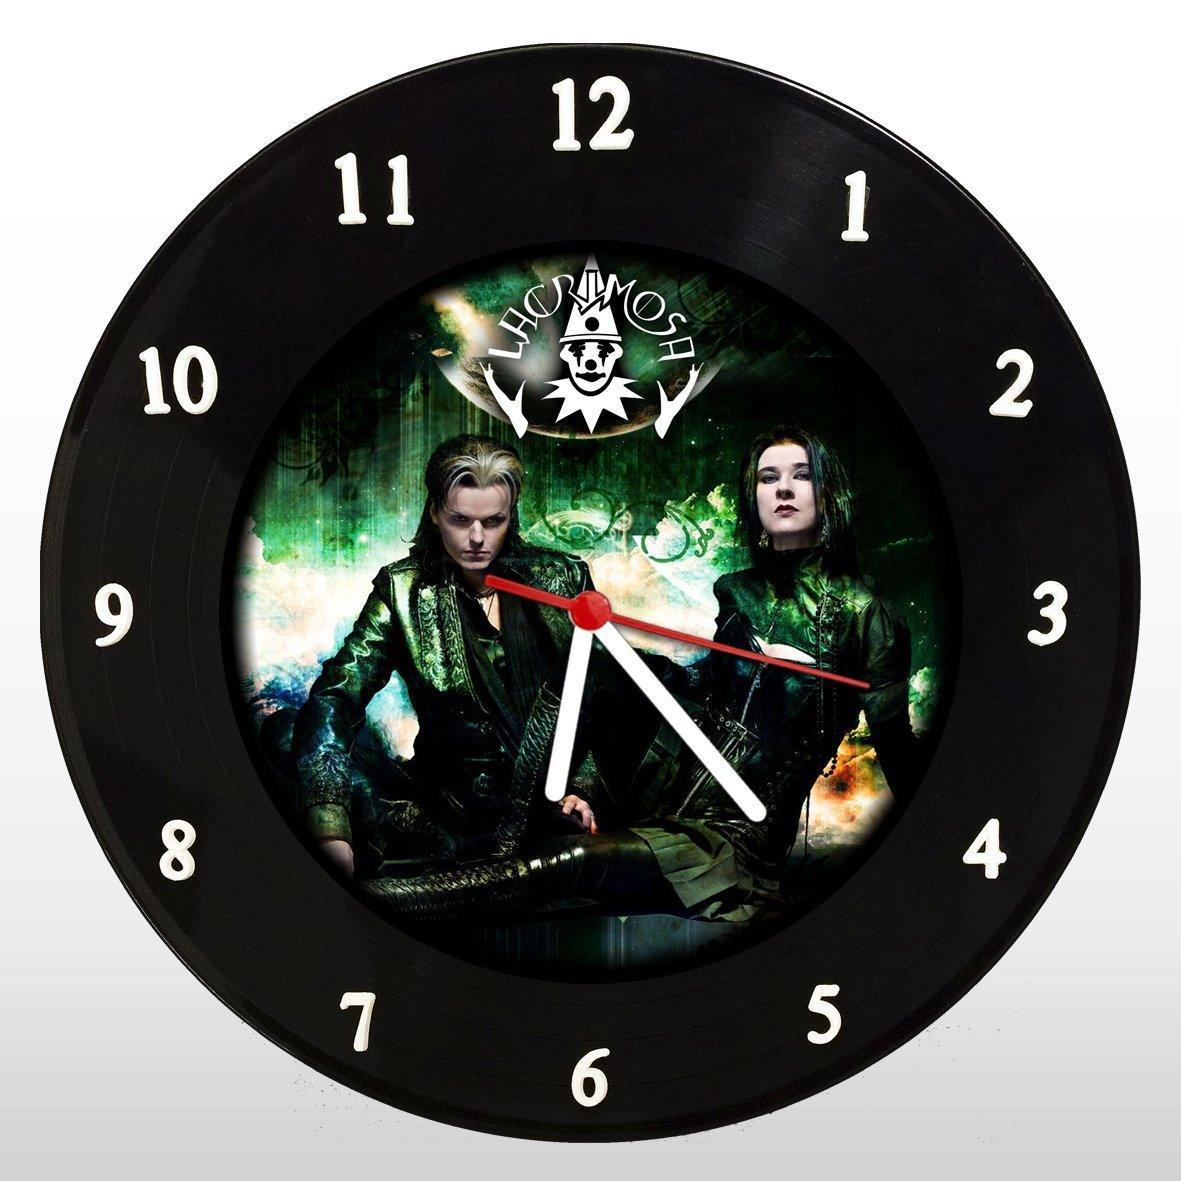 Lacrimosa - Relógio de Parede em Disco de Vinil - Mr. Rock